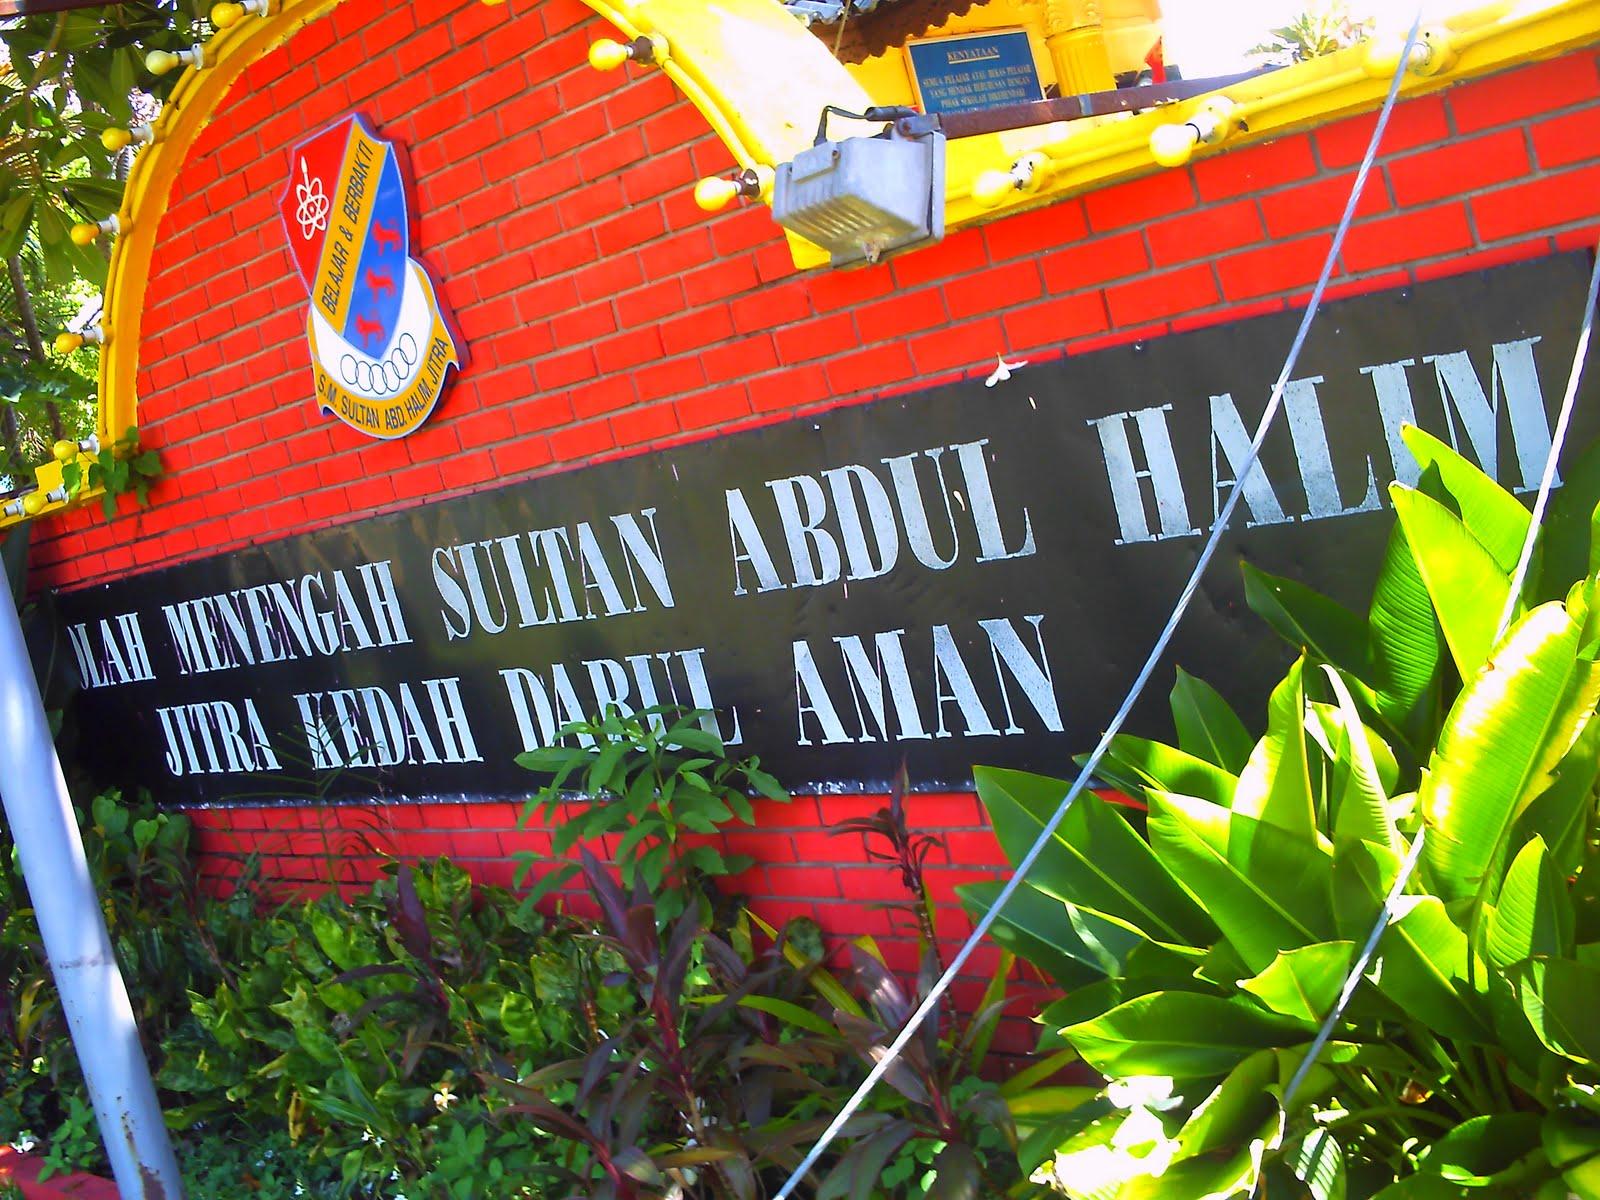 My Life My Style Sekolah Menengah Sultan Abdul Halim Jitra